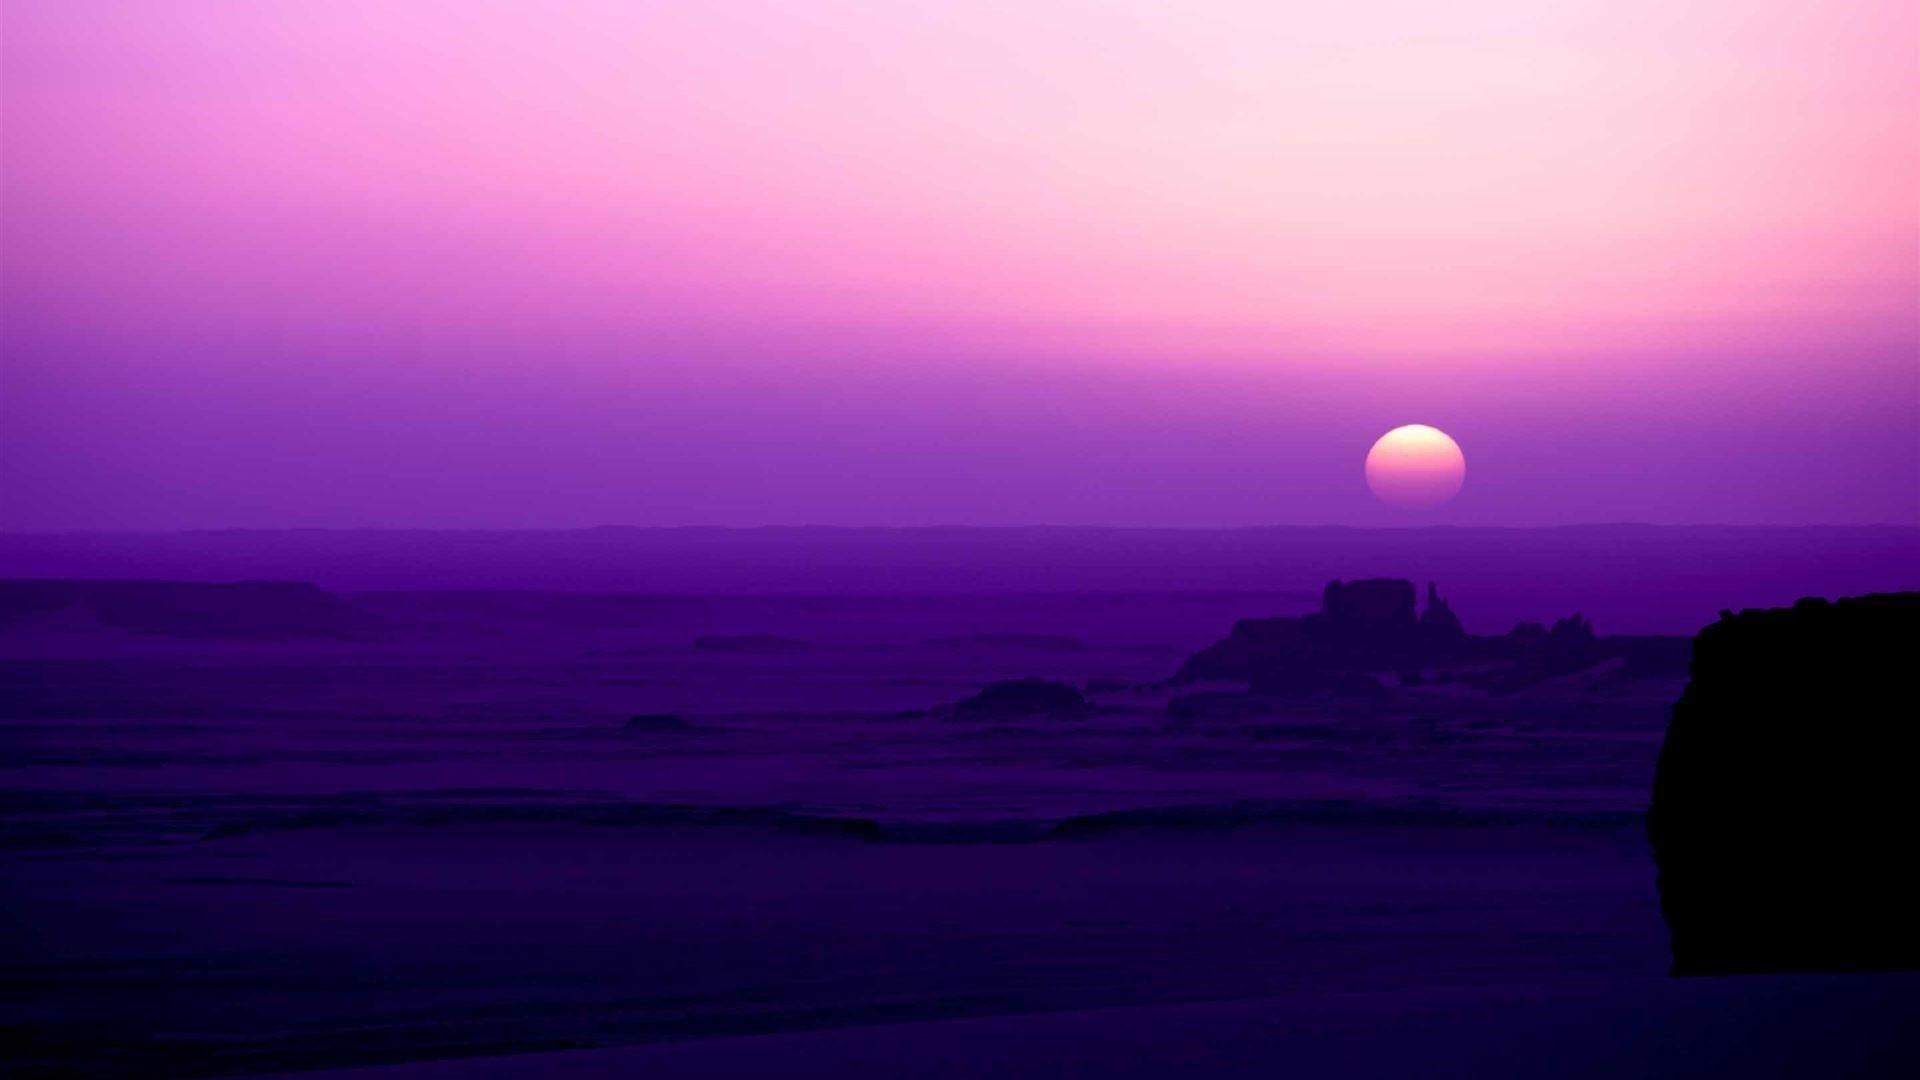 Purple Sky Wallpaper theme